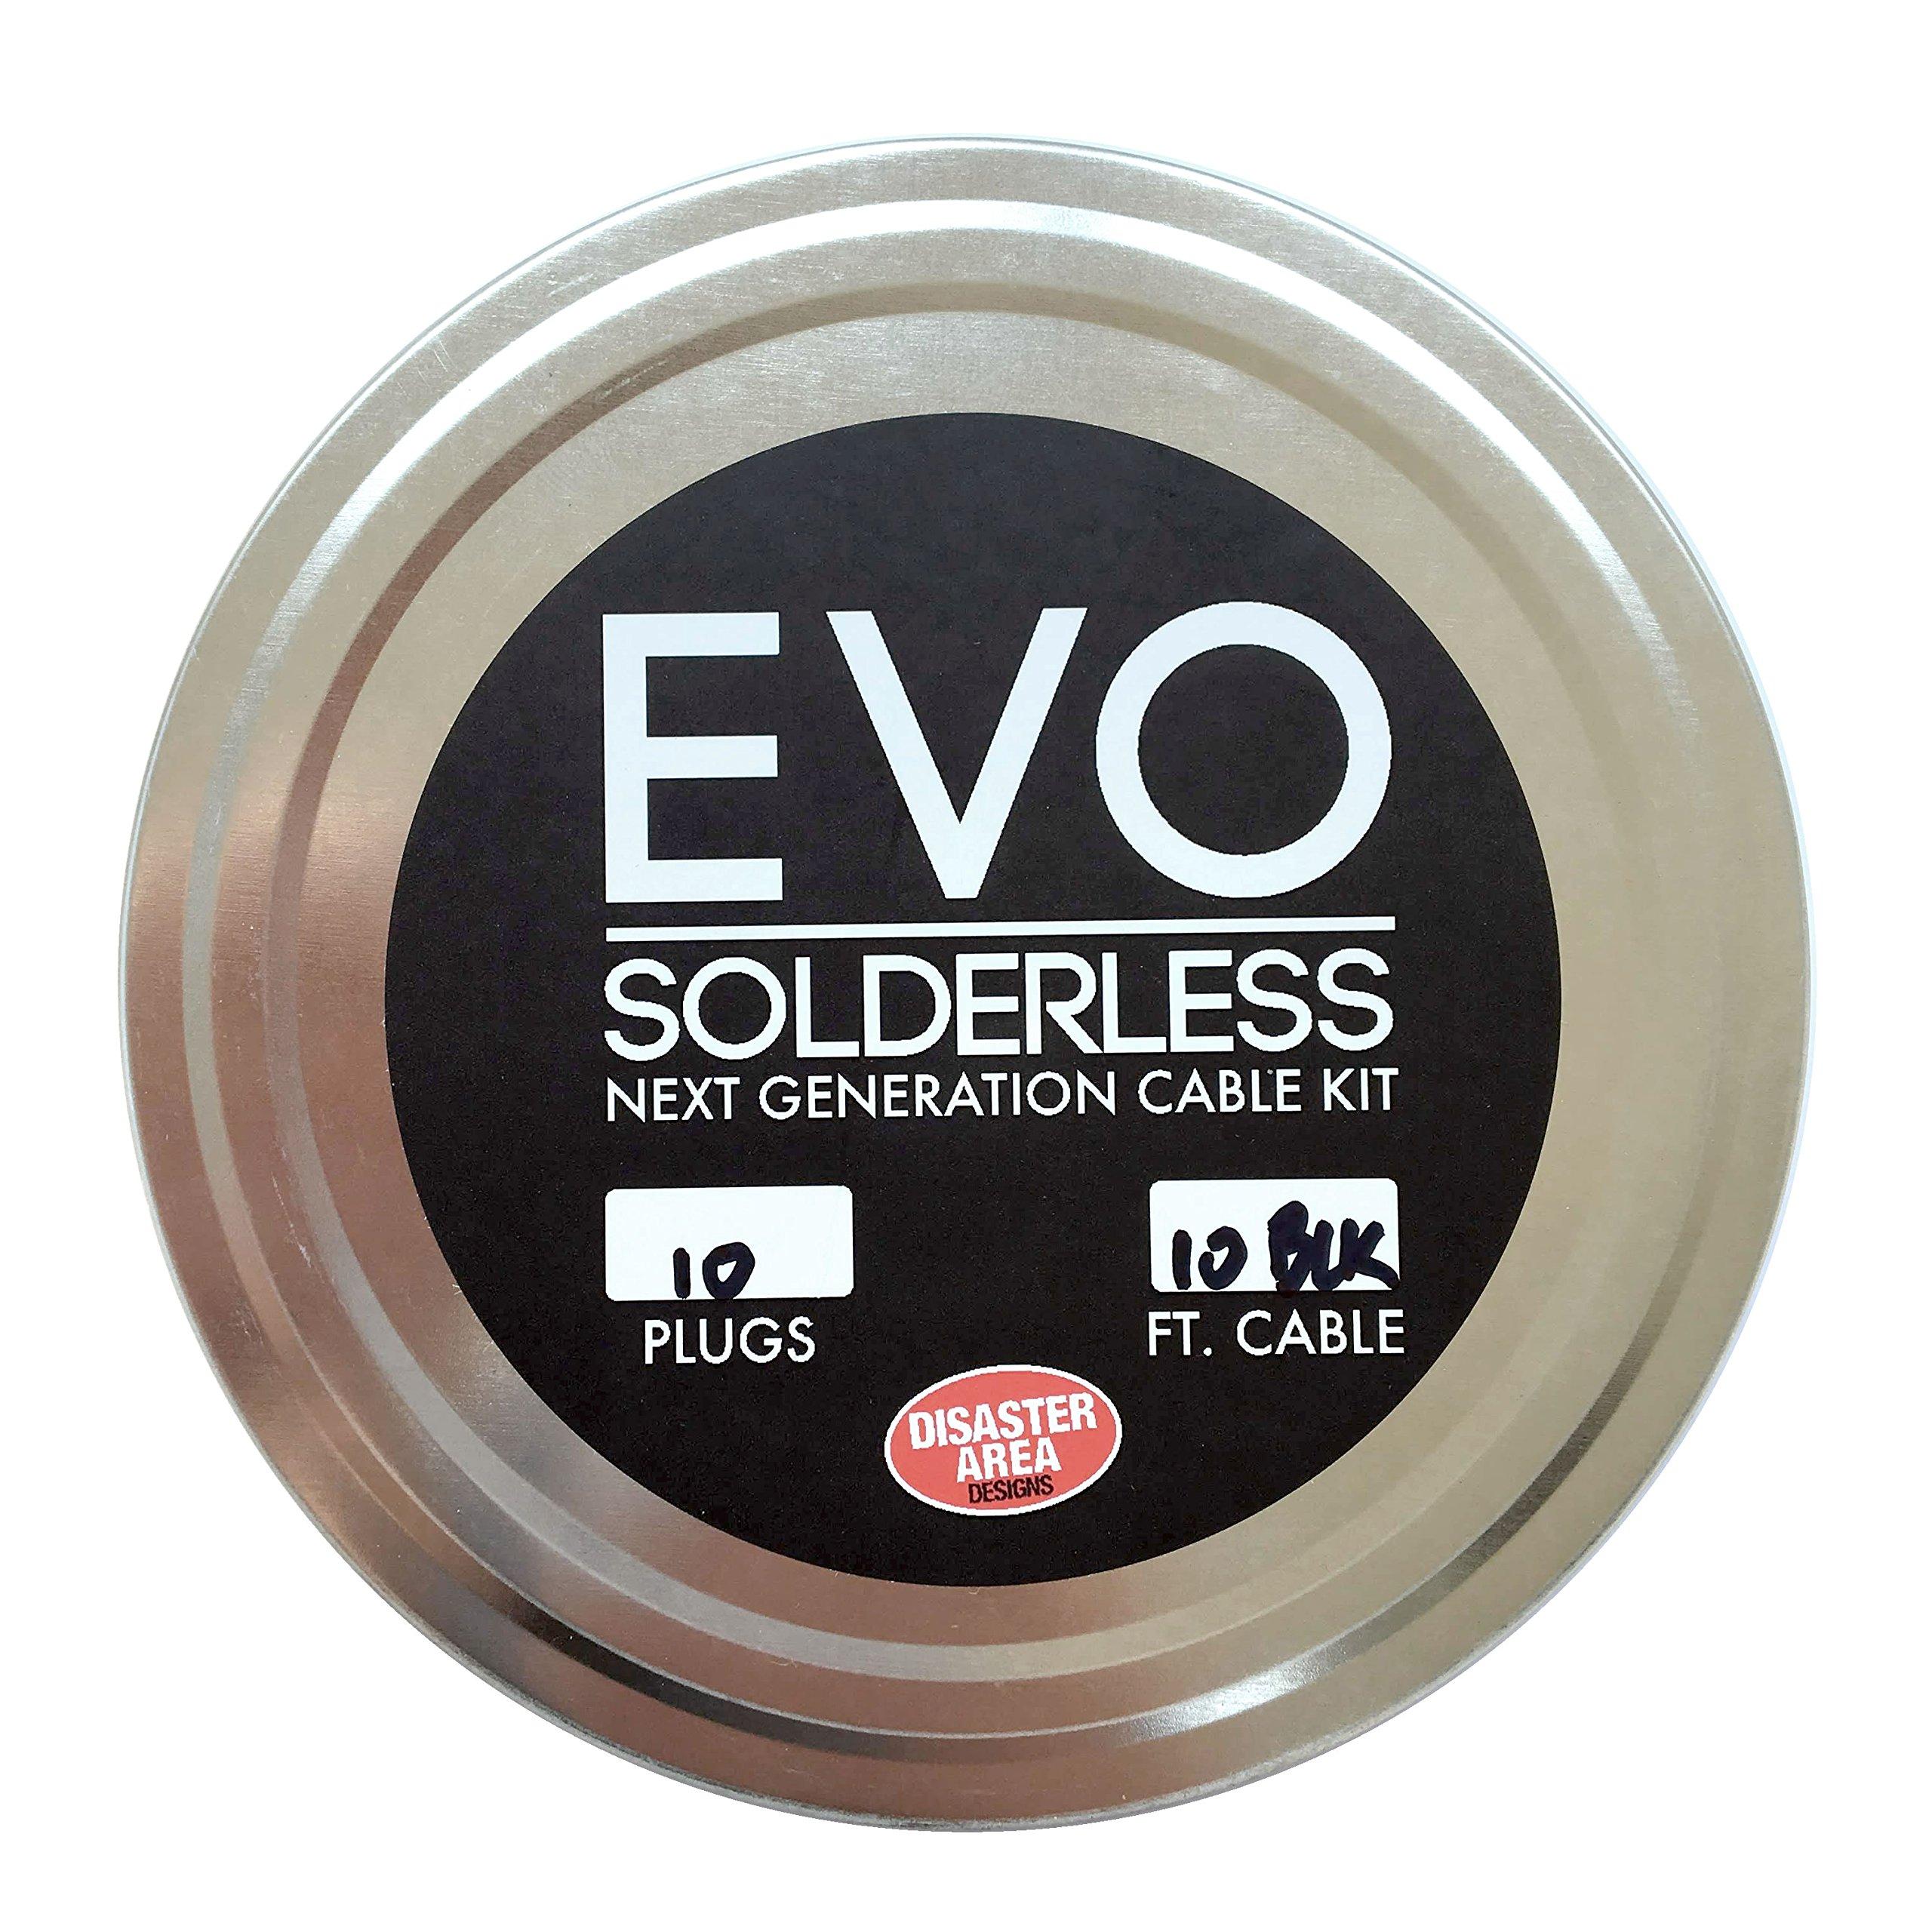 Disaster Area Designs EVO Solderless Cable Kit - Black, 10ft, 10 Plugs